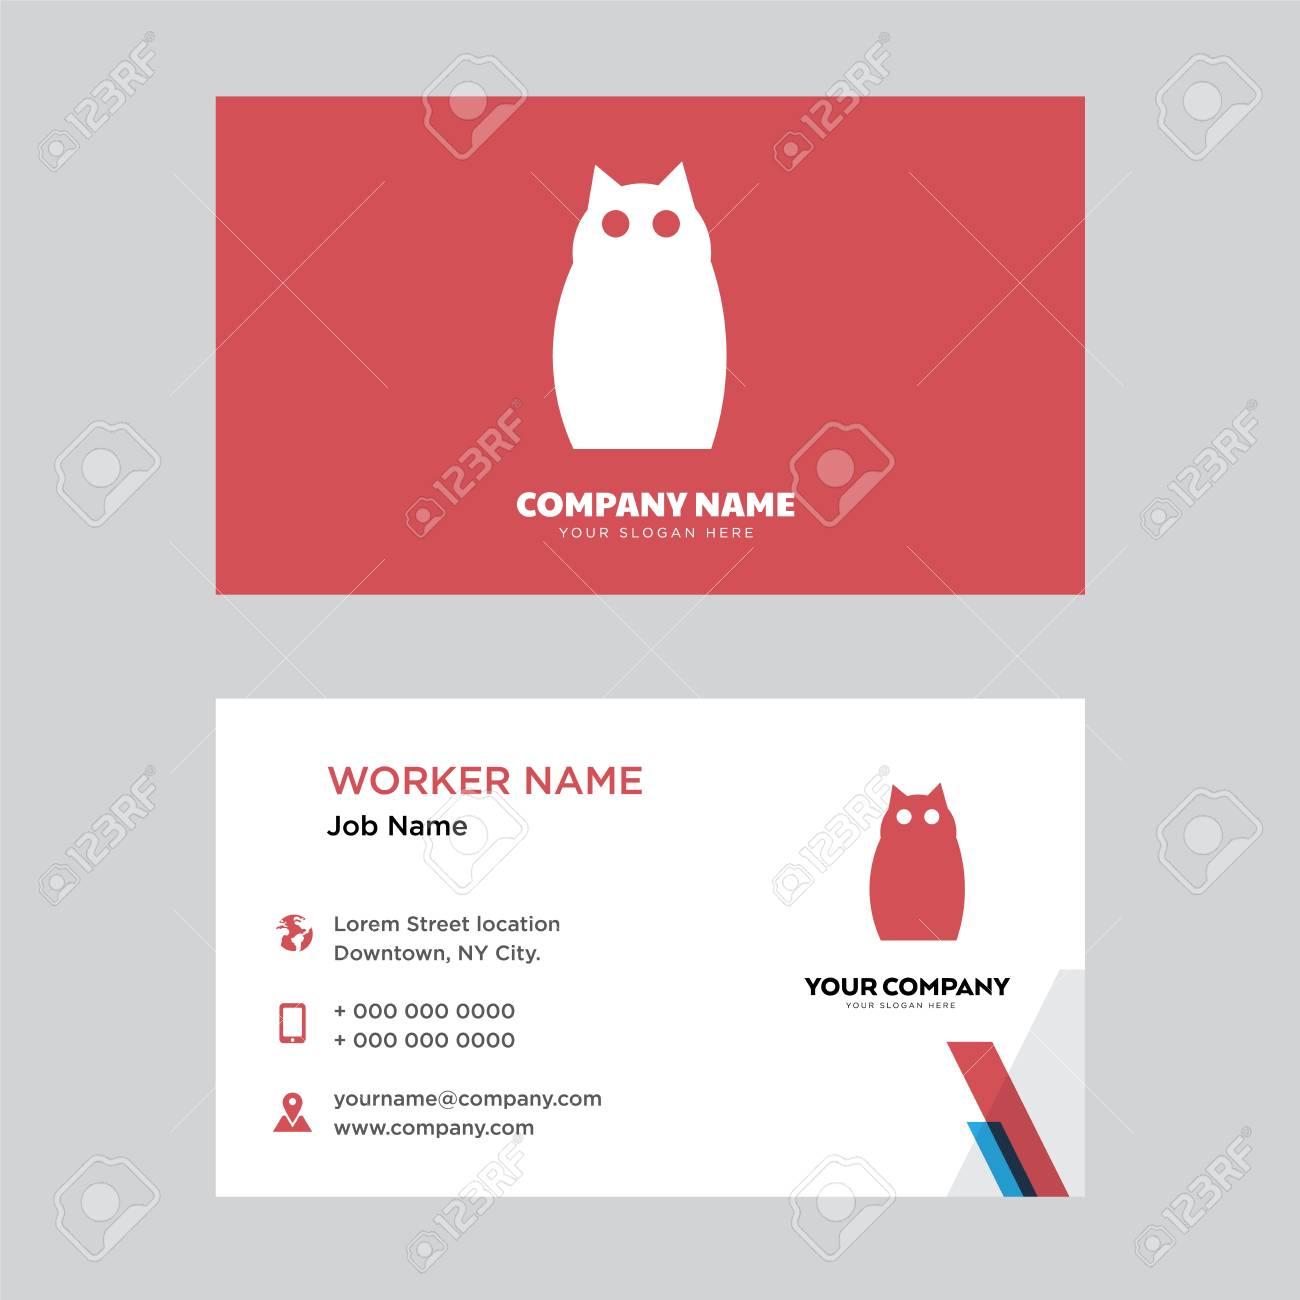 Owl business card design template visiting for your company owl business card design template visiting for your company modern horizontal identity card vector colourmoves